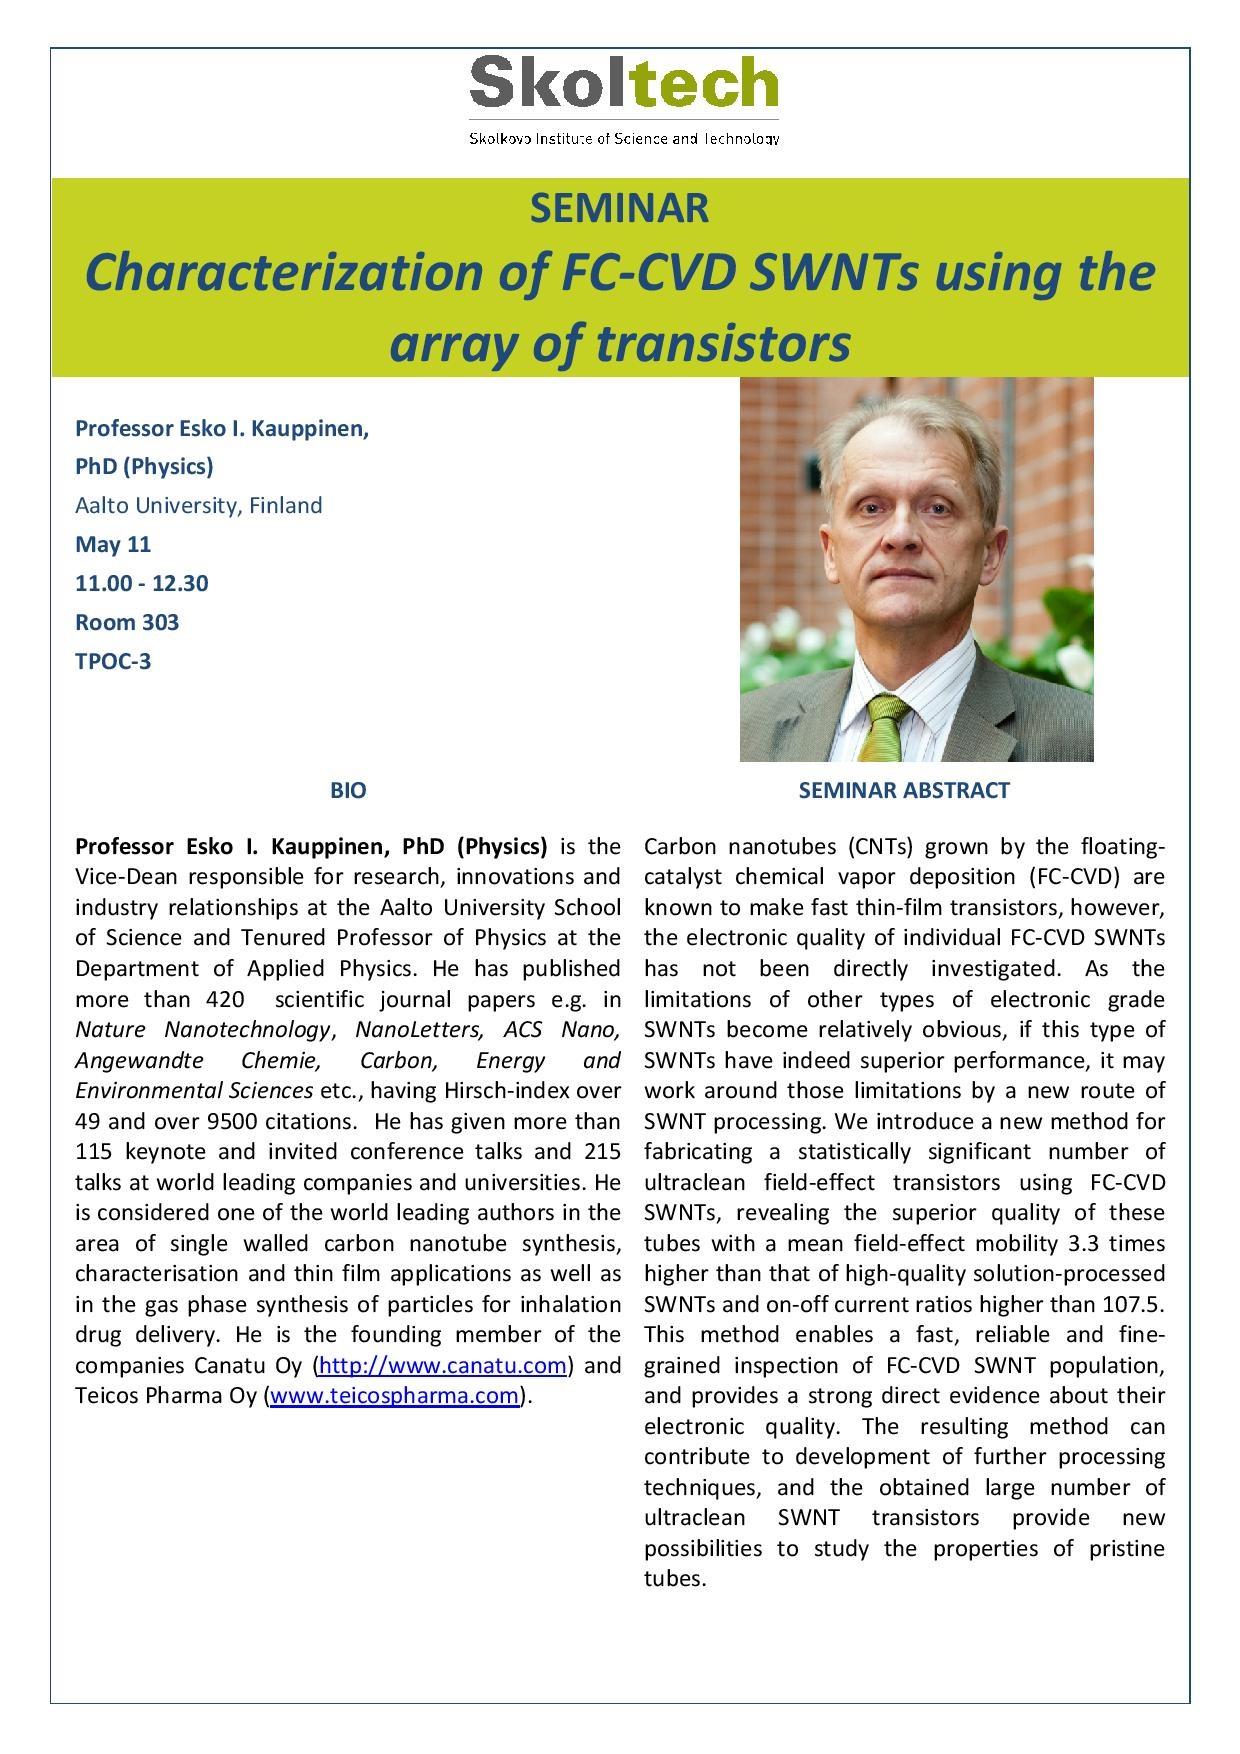 seminar-prof-esko-1-page-001